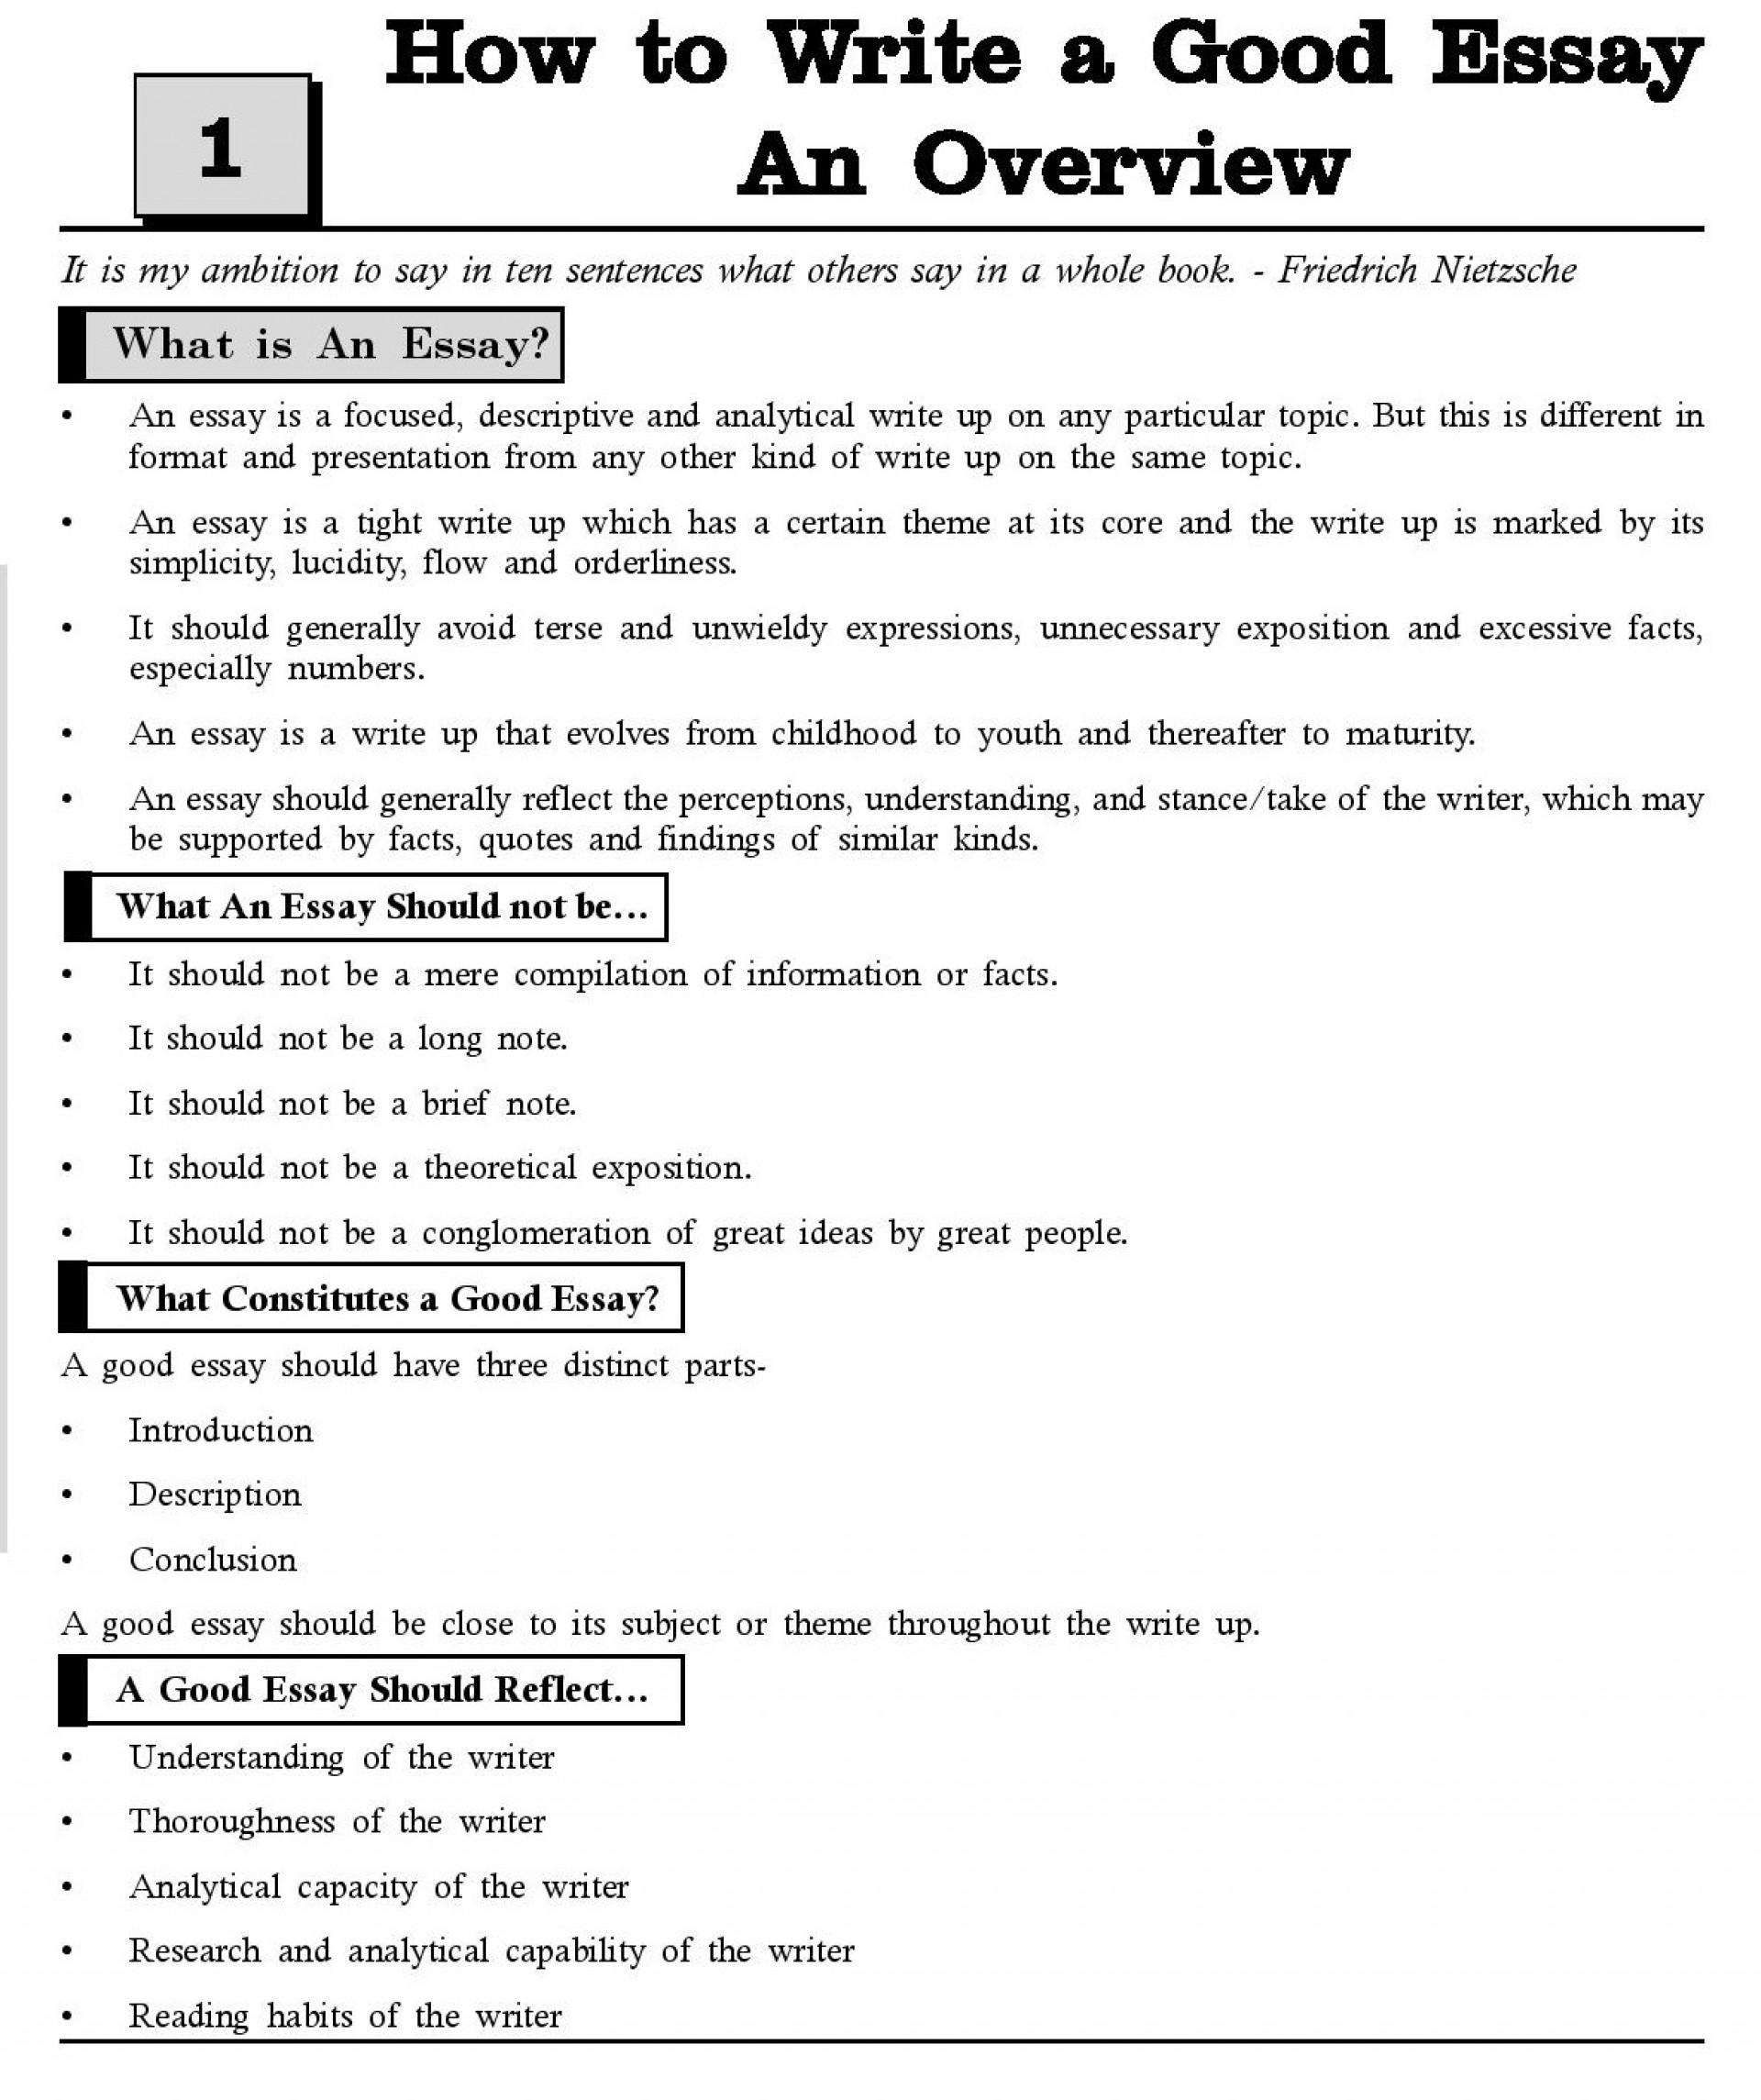 003 Tips To Write Good Essay How20to20write20a20good20essay Marvelous A Sat Descriptive Narrative 1920